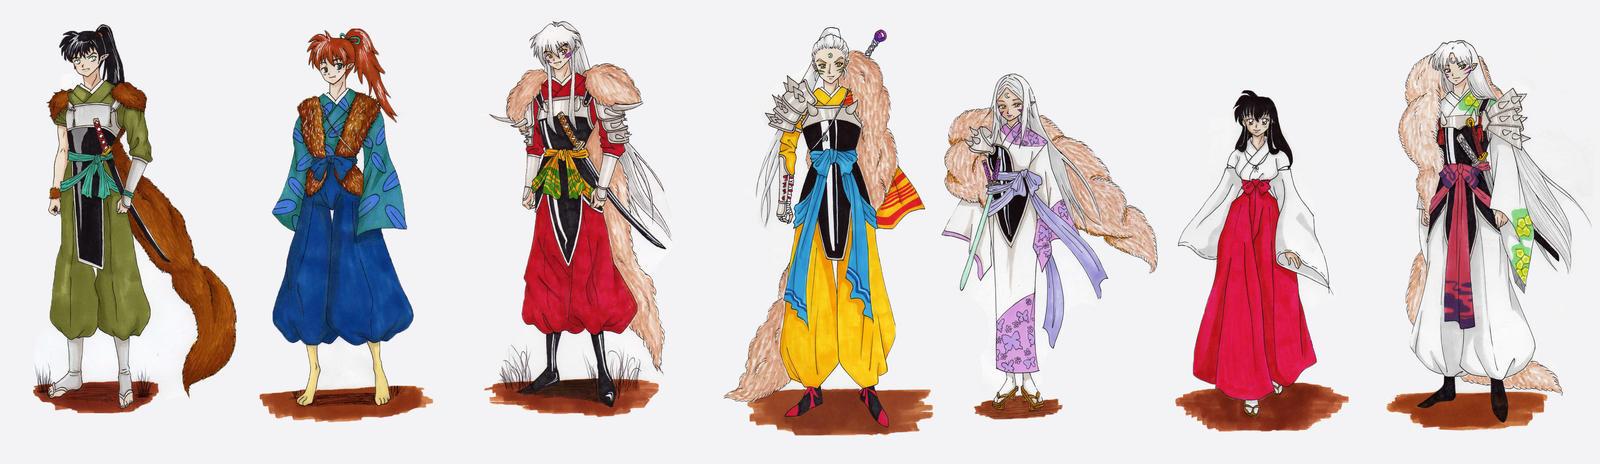 Inuyasha New Era Characters NEW SERIE By Pamelita 483